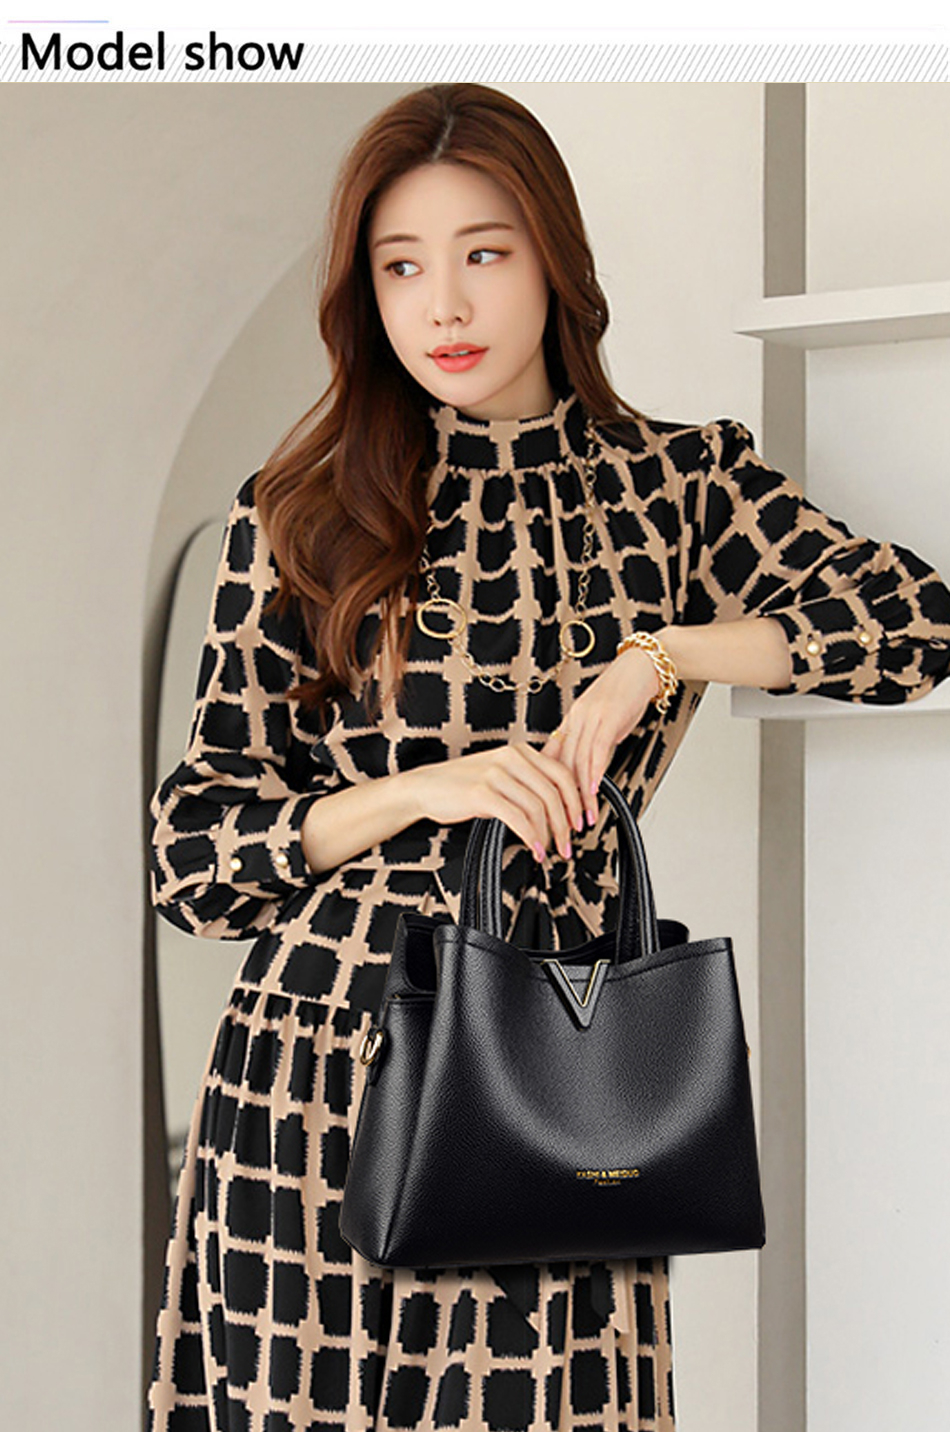 Marca designer de couro bolsas de luxo